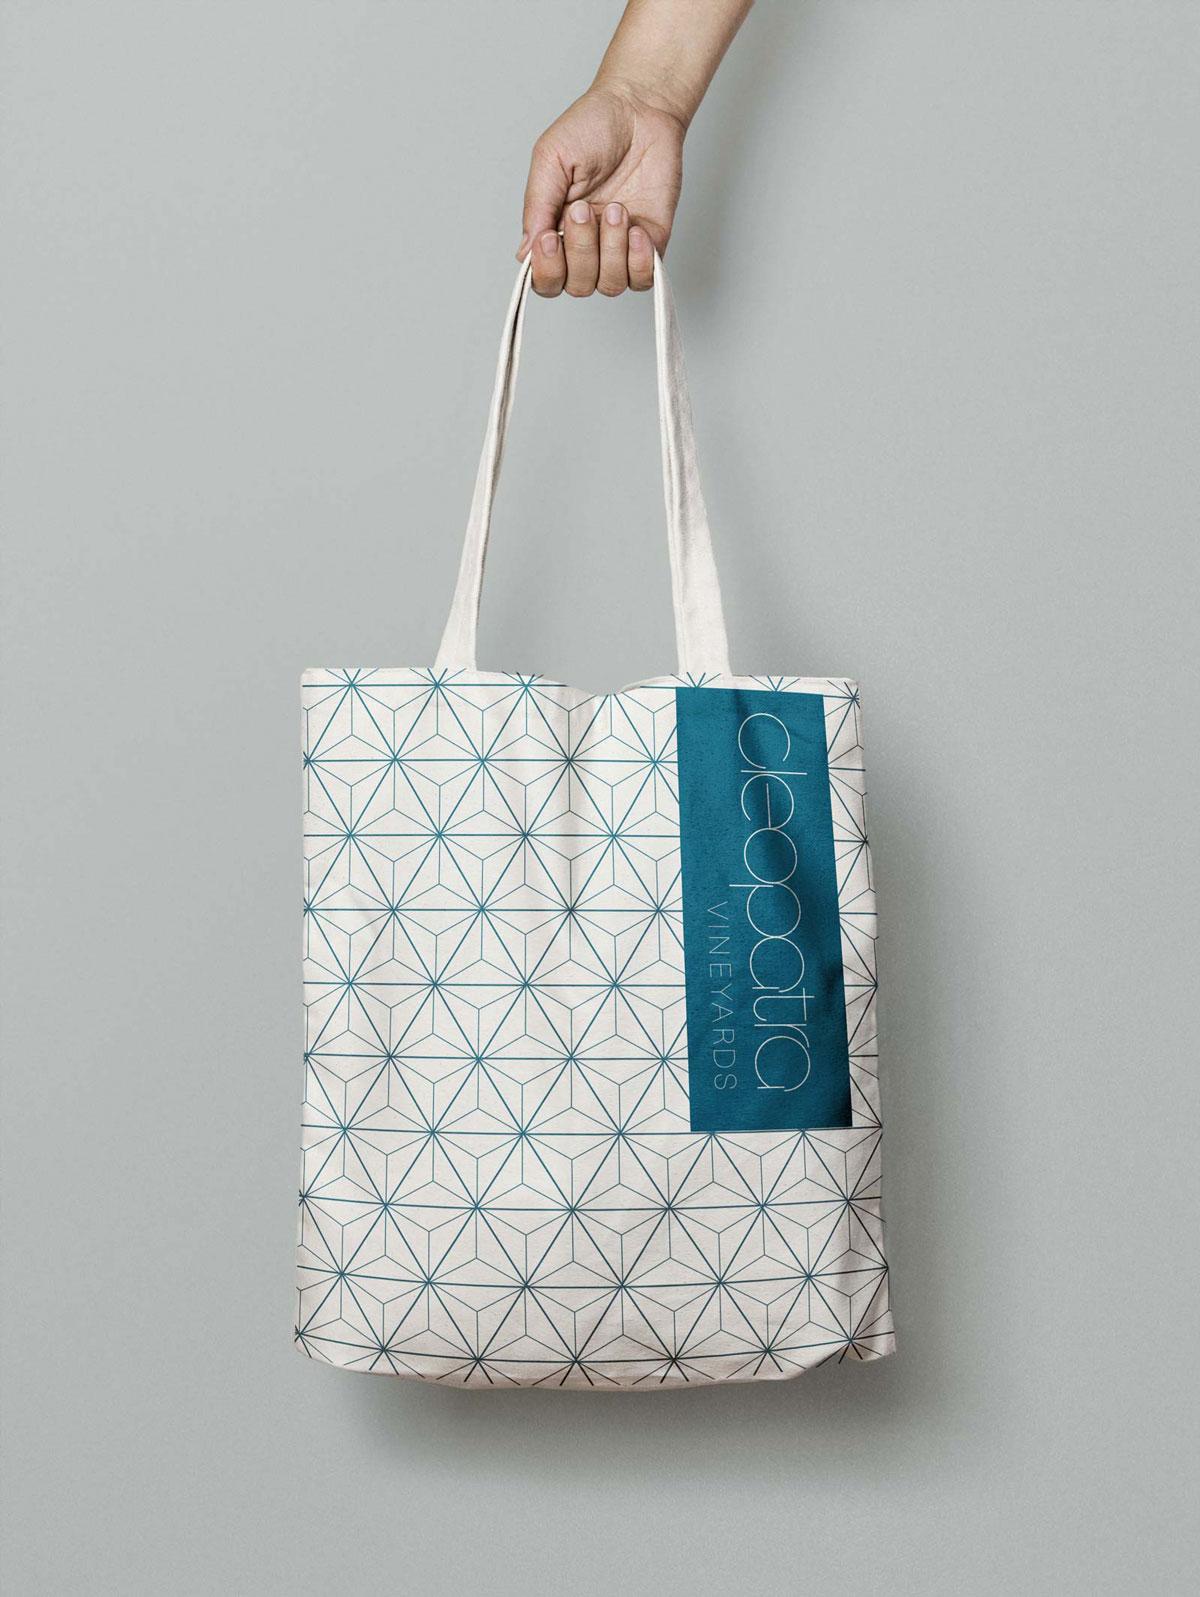 cleopatra brand identity canvas tote bag